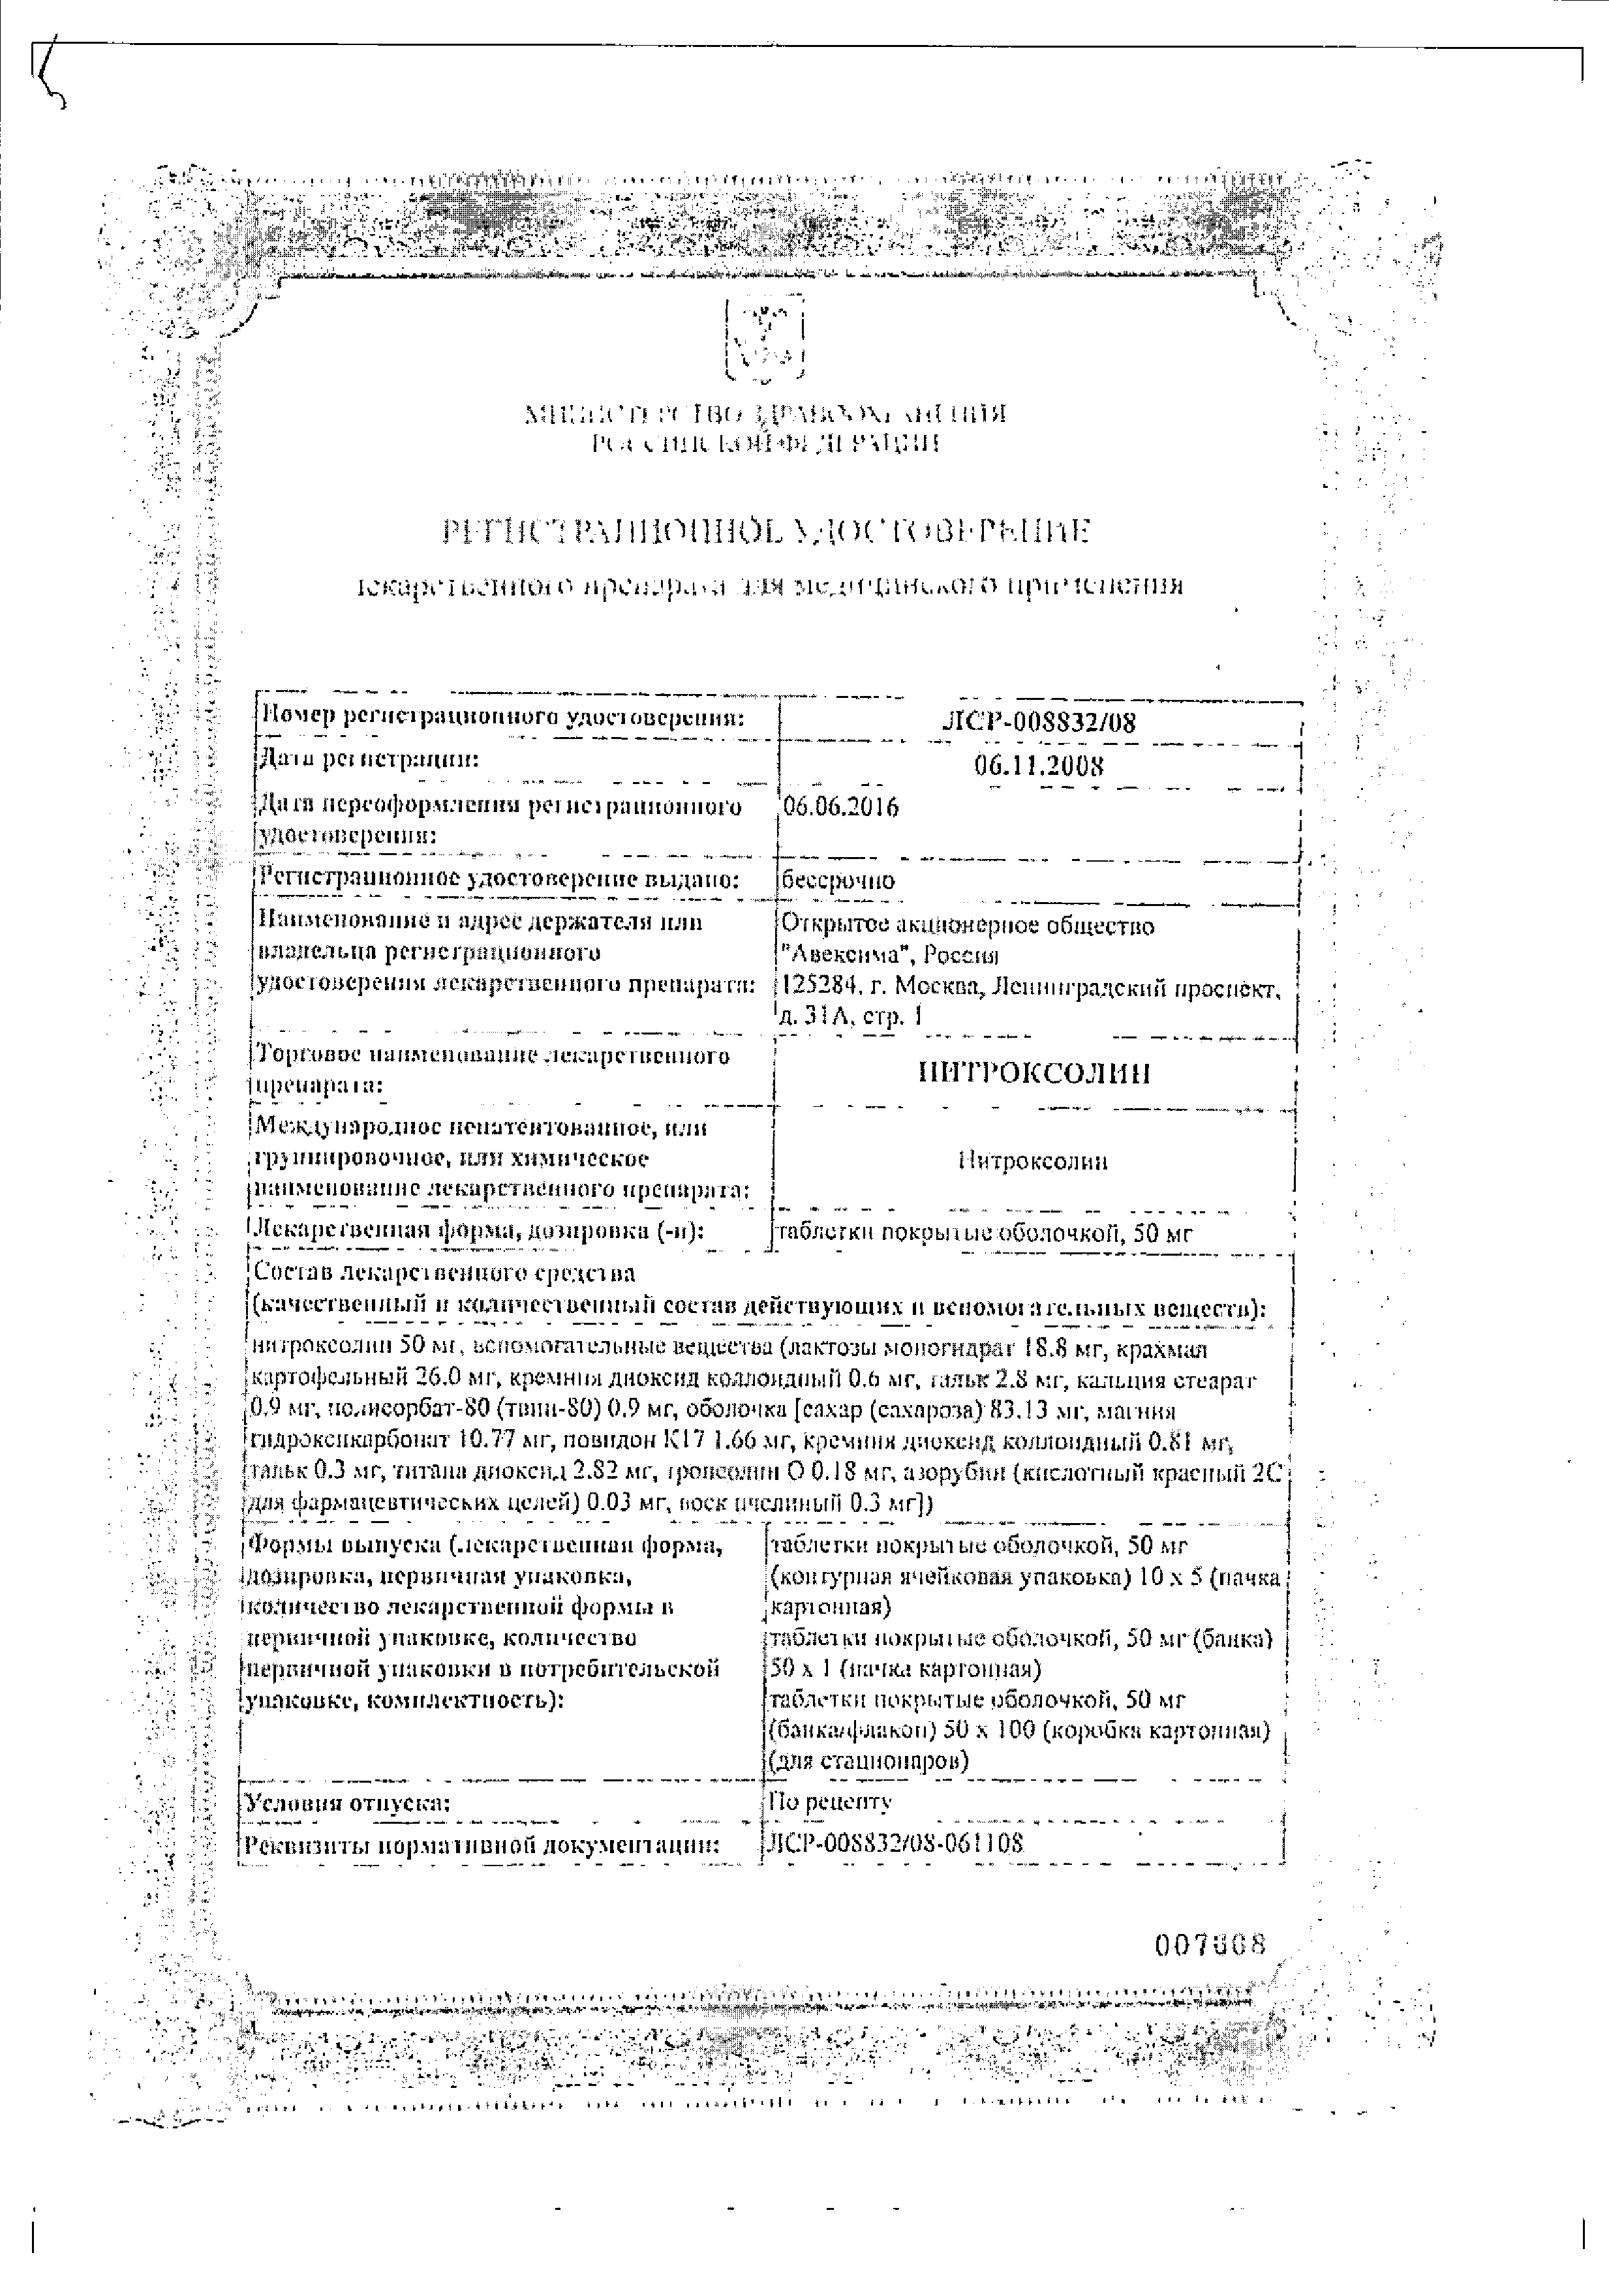 Нитроксолин сертификат